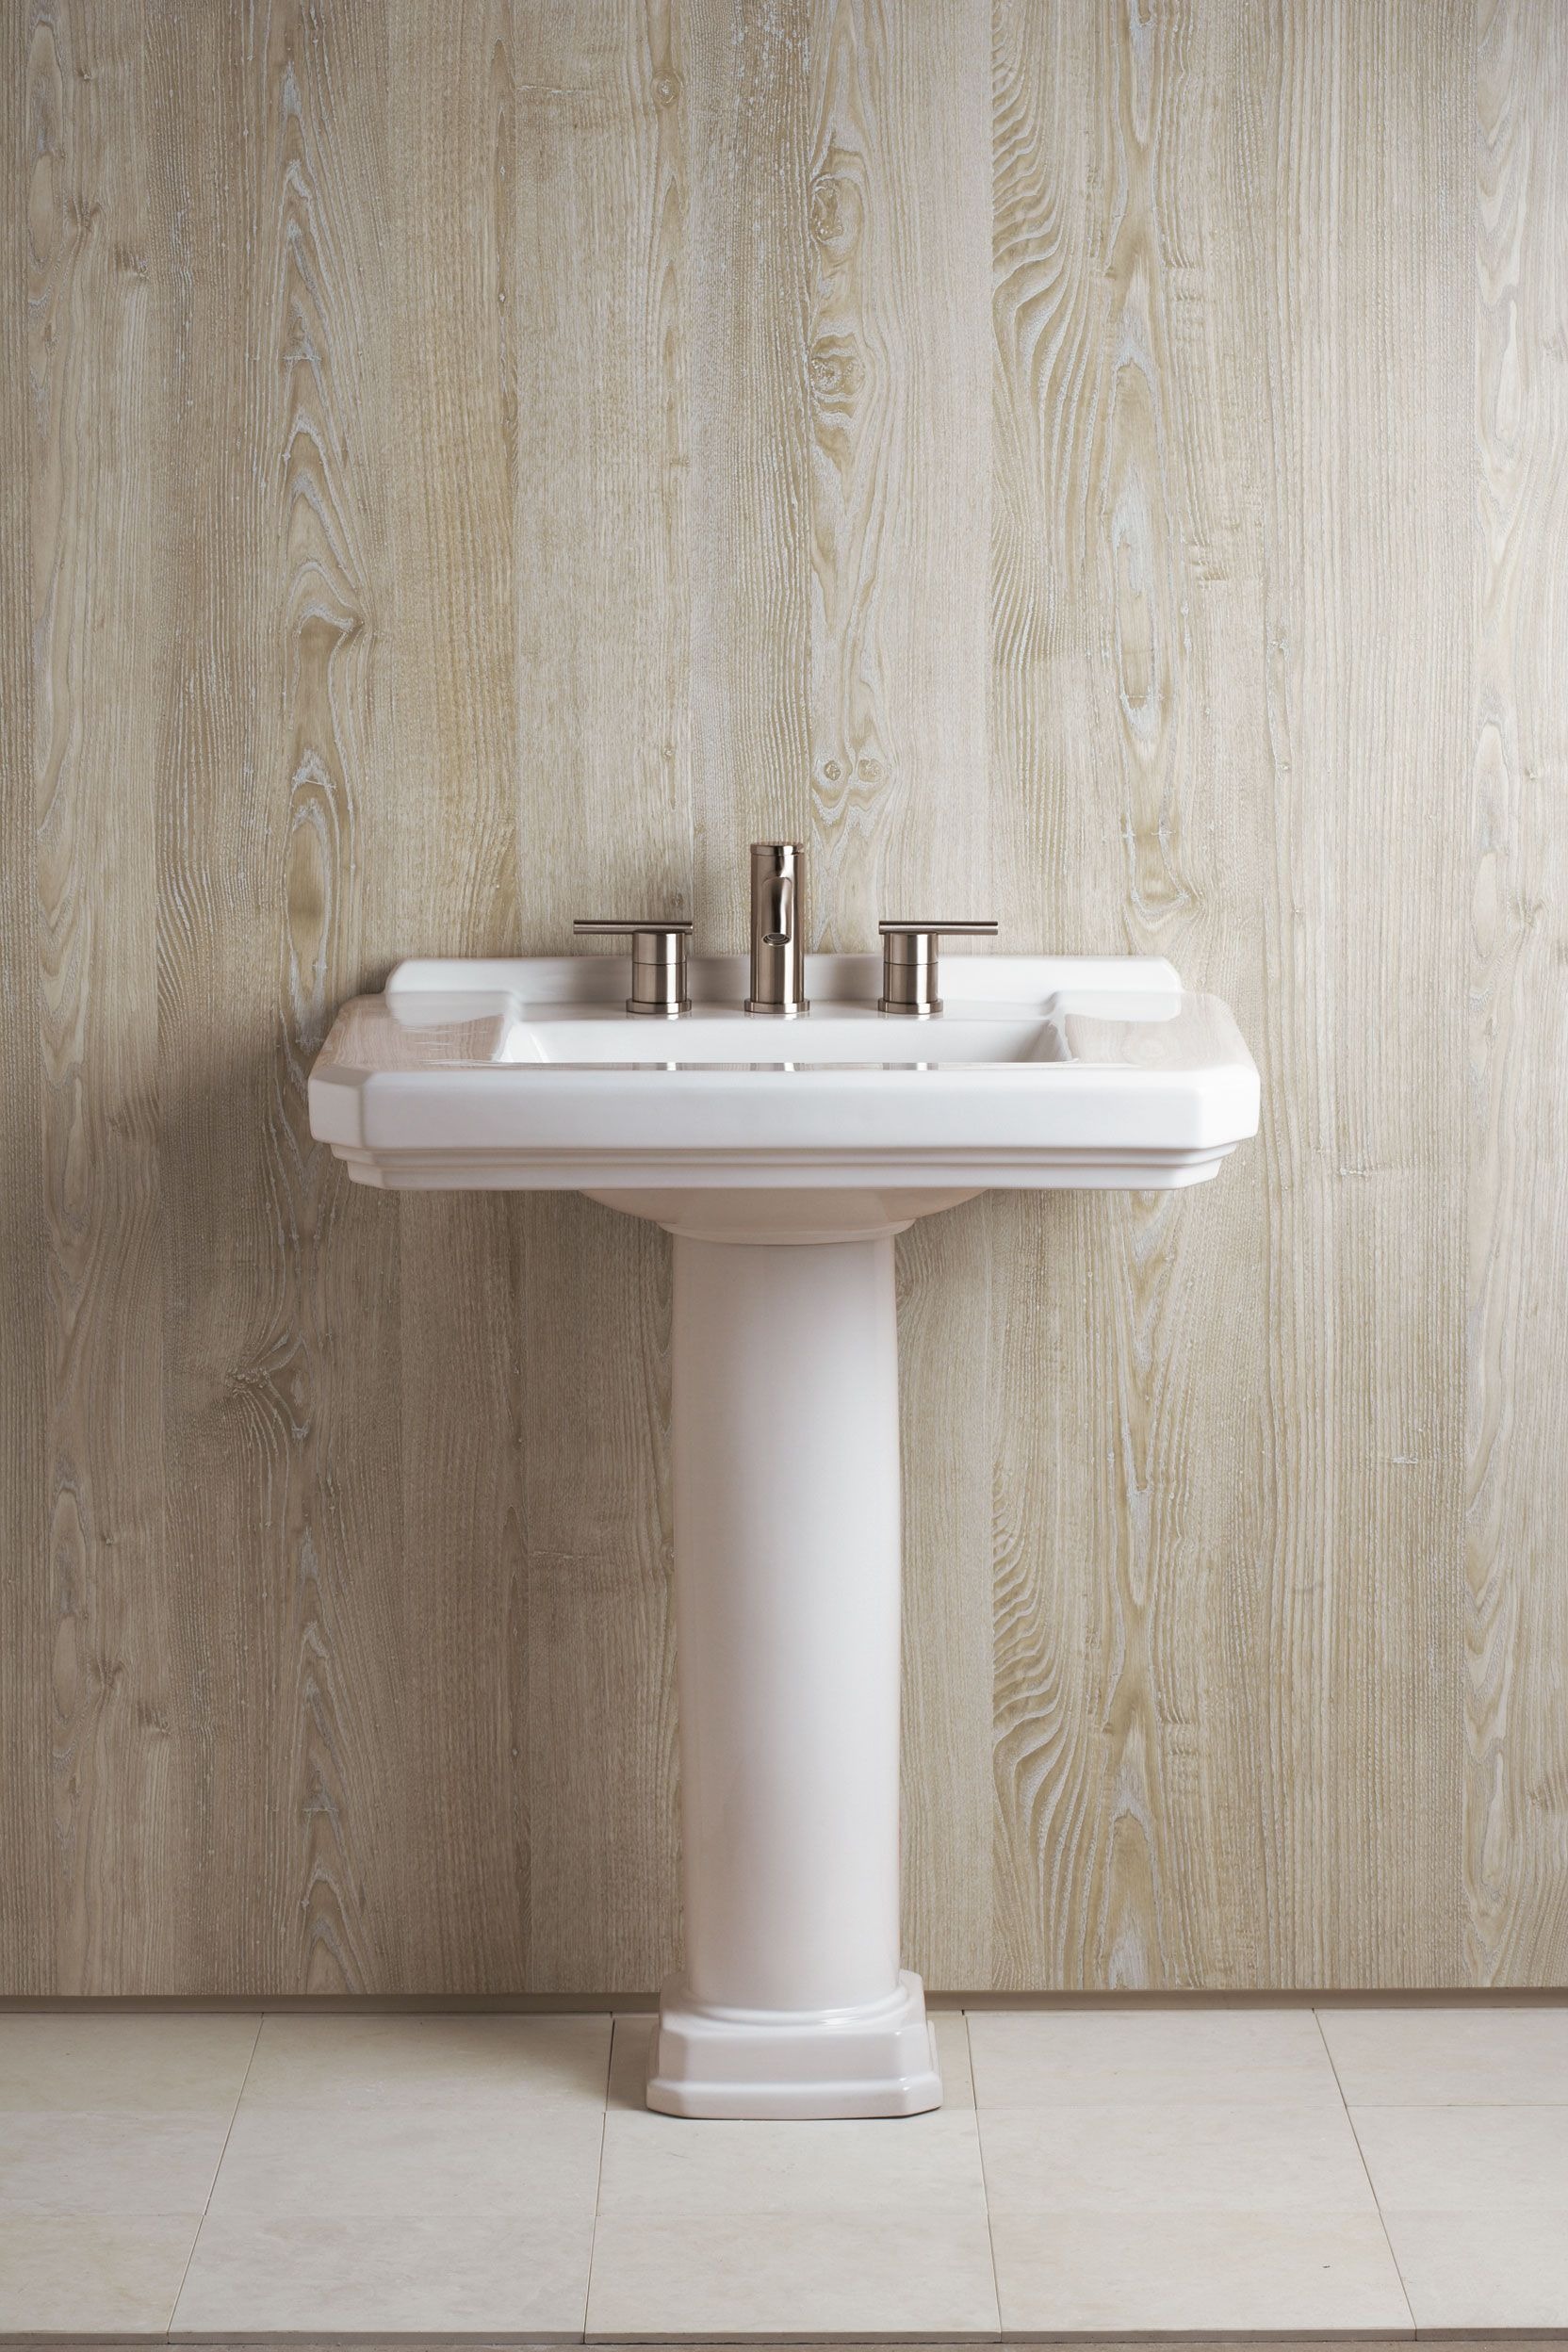 pedestal sink or vanity in small bathroom%0A Danze Cirtangular Pedestal Lavatory  u     Parma   handle bathroom faucet  transitional bathroom vanities and sink consoles